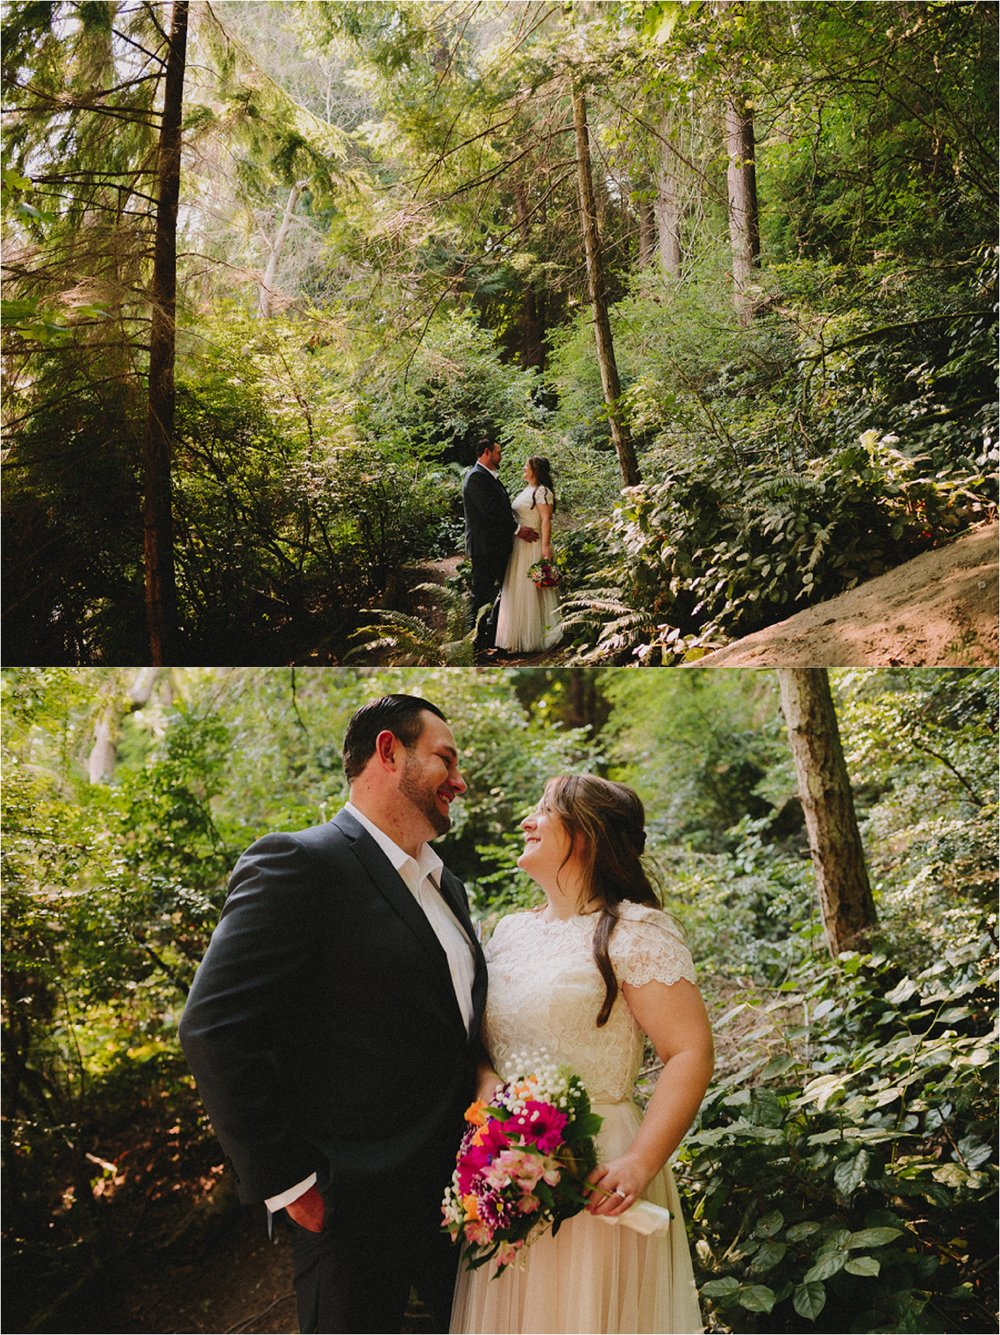 owen-beach-priest-point-park-tacoma-washington-elopement-jannicka-mayte-anchorage-alaska-wedding-elopement-photographer (30).jpg